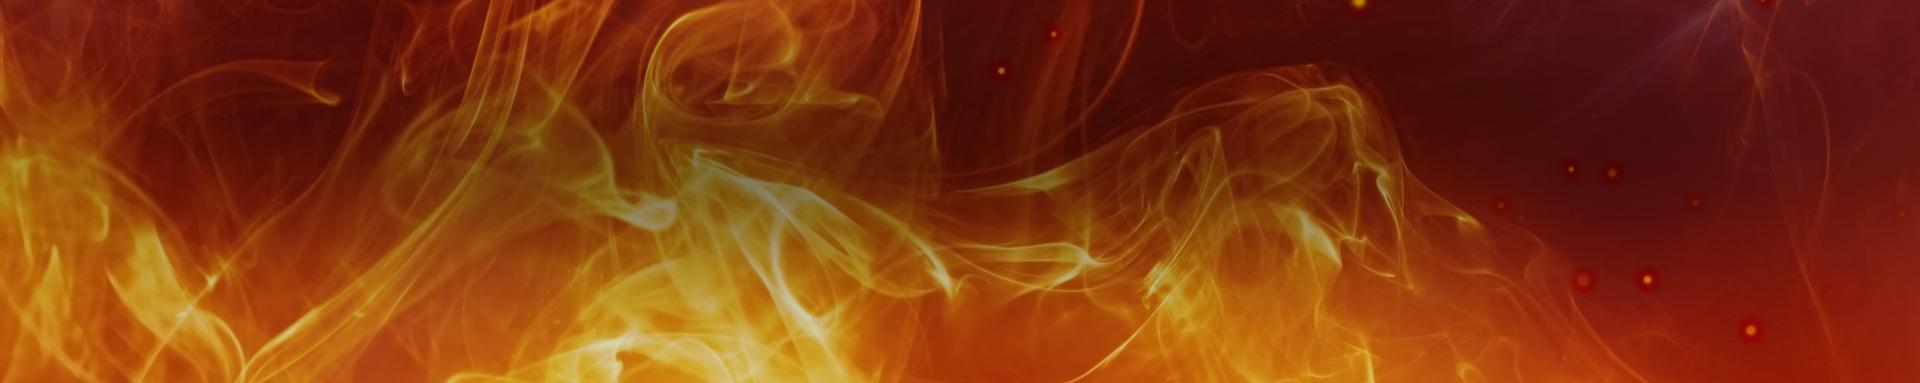 Australasian Fire & Safety